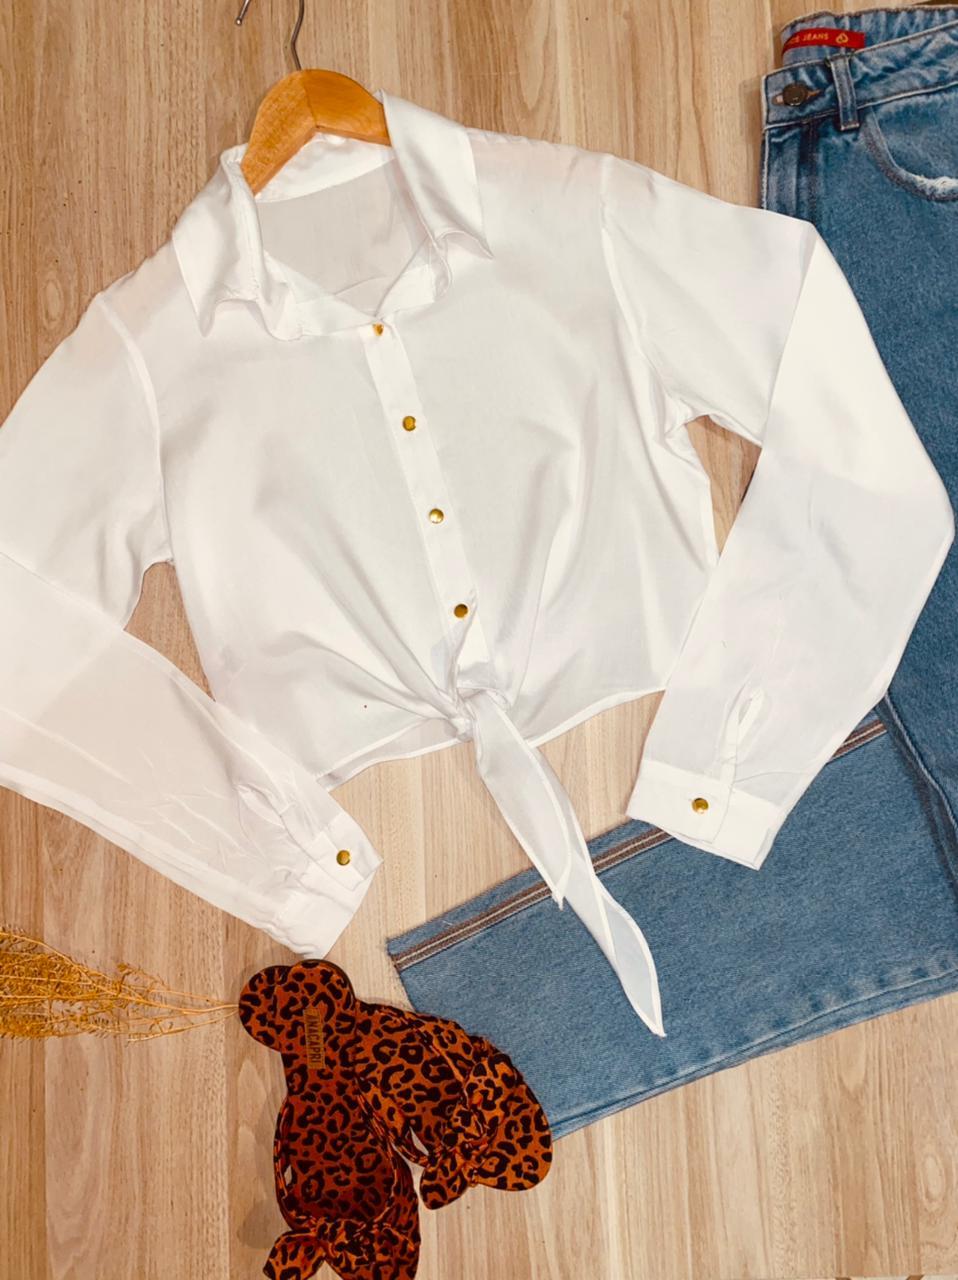 Camisa Manga Longa de Amarrar Embaixo Florença Branca